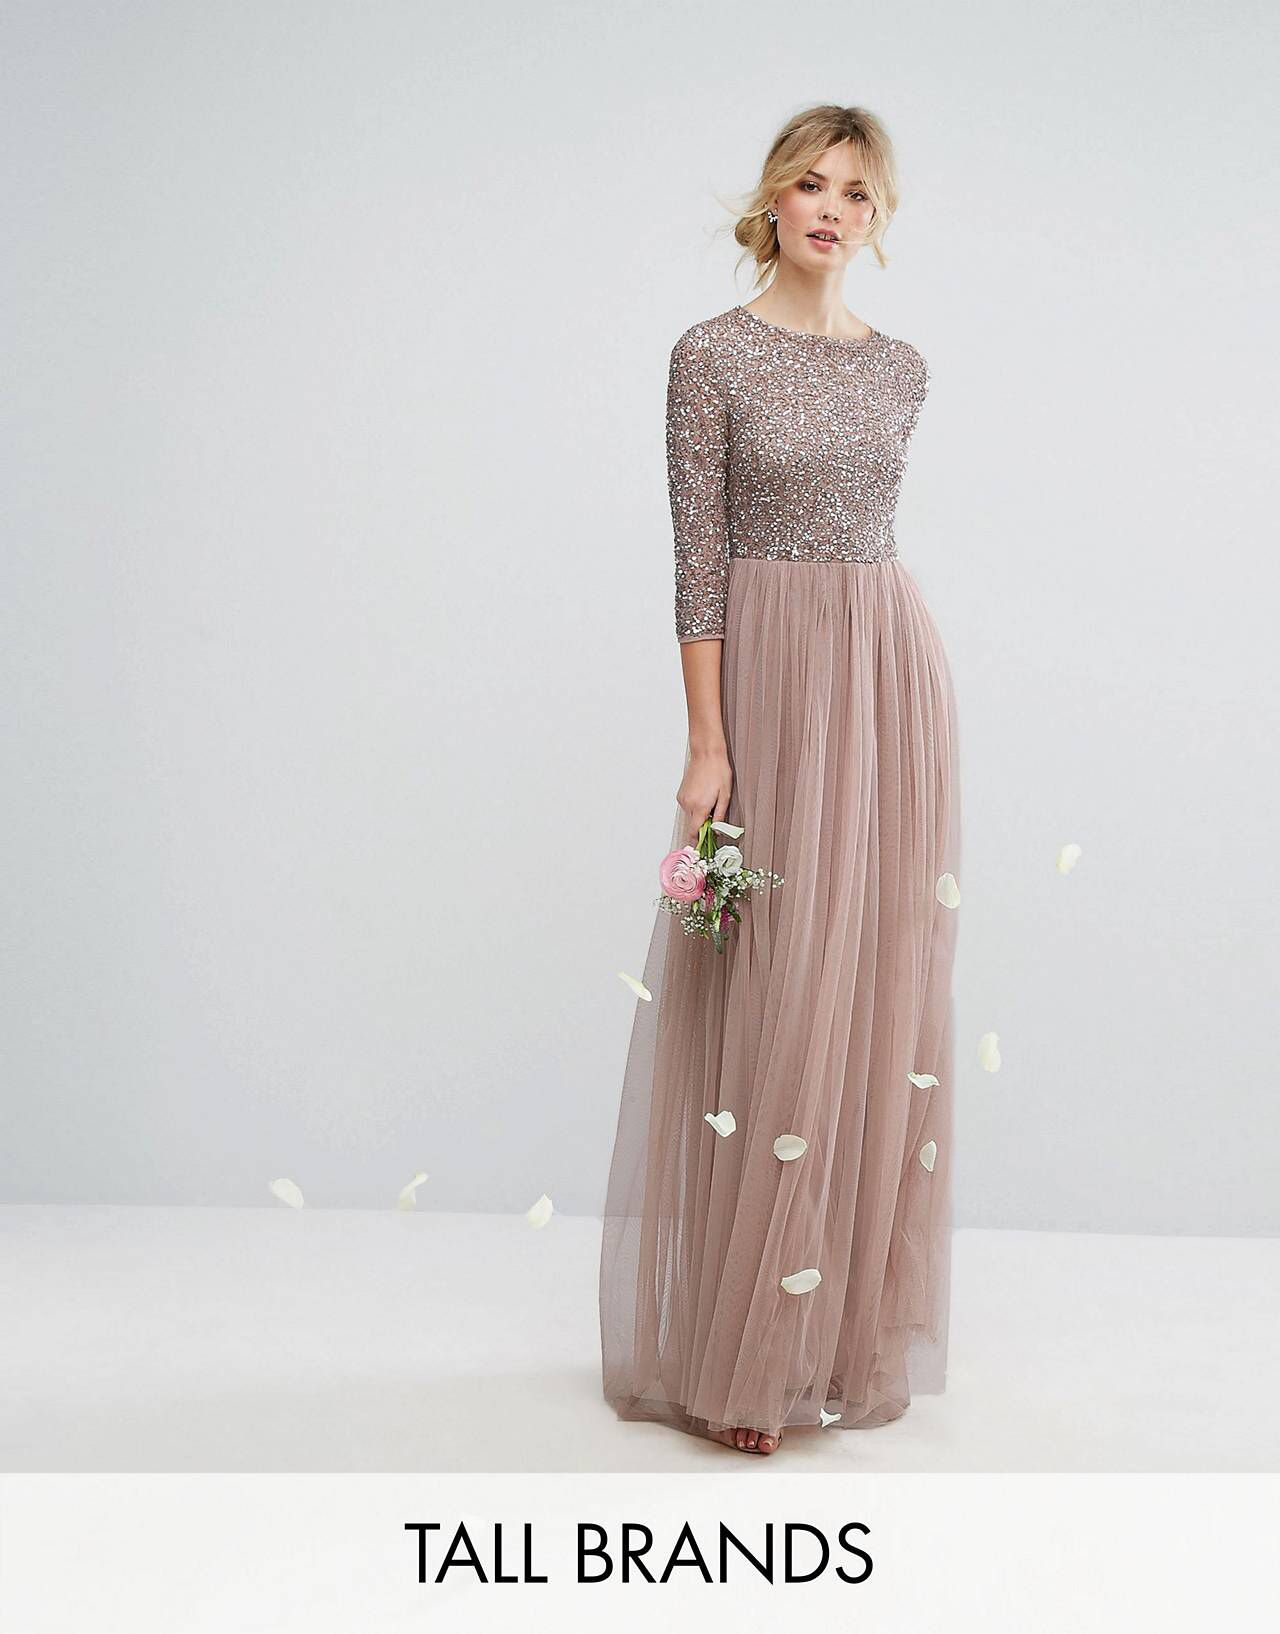 36a30cef529ff Maya Tall Long Sleeve Sequin Top Maxi Tulle Dress